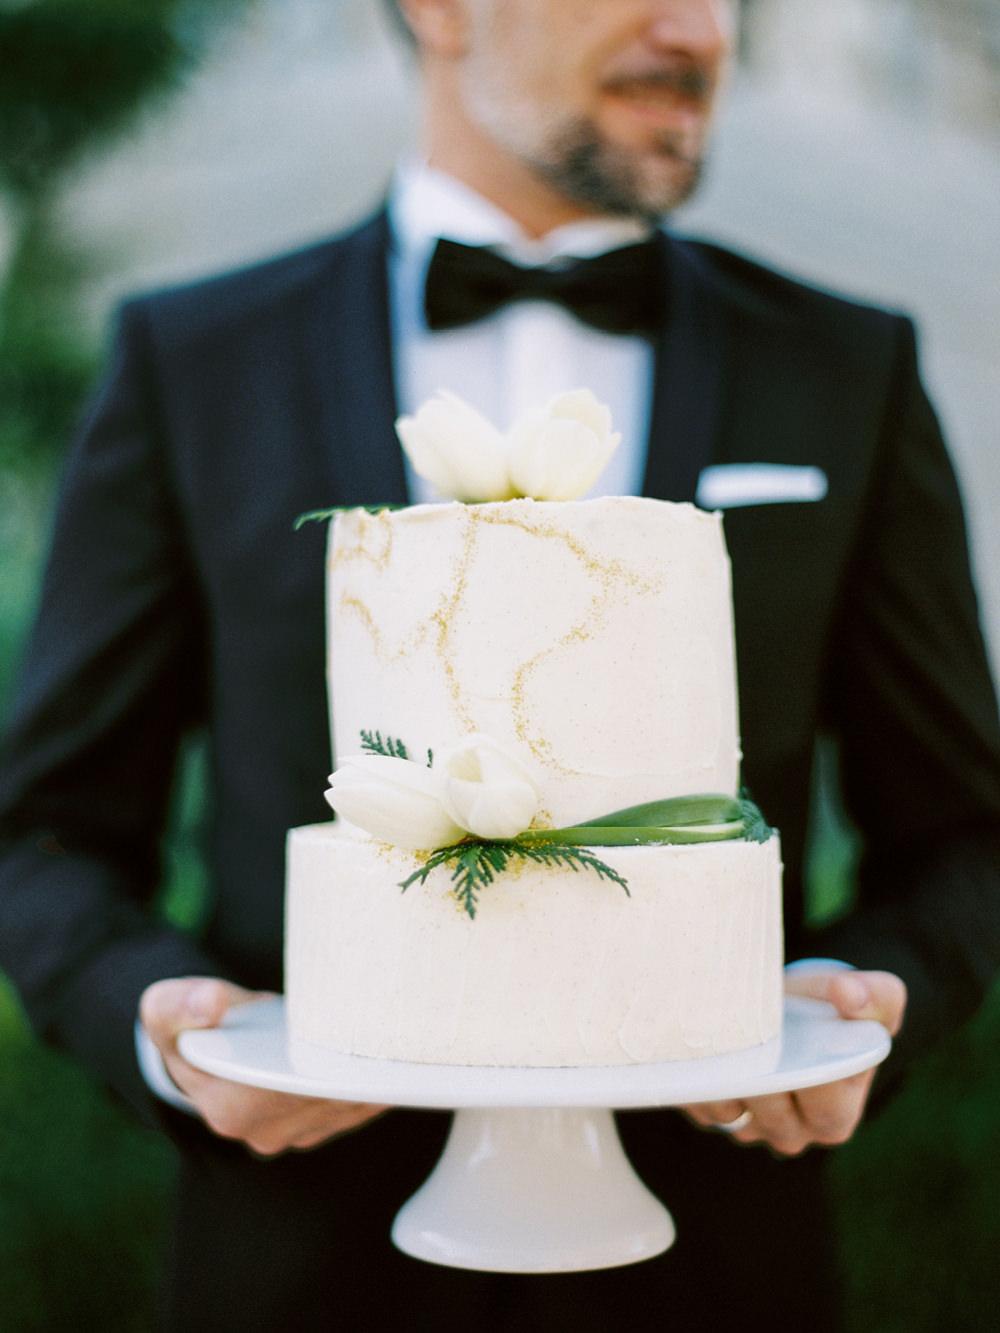 film fineart wedding photography cake